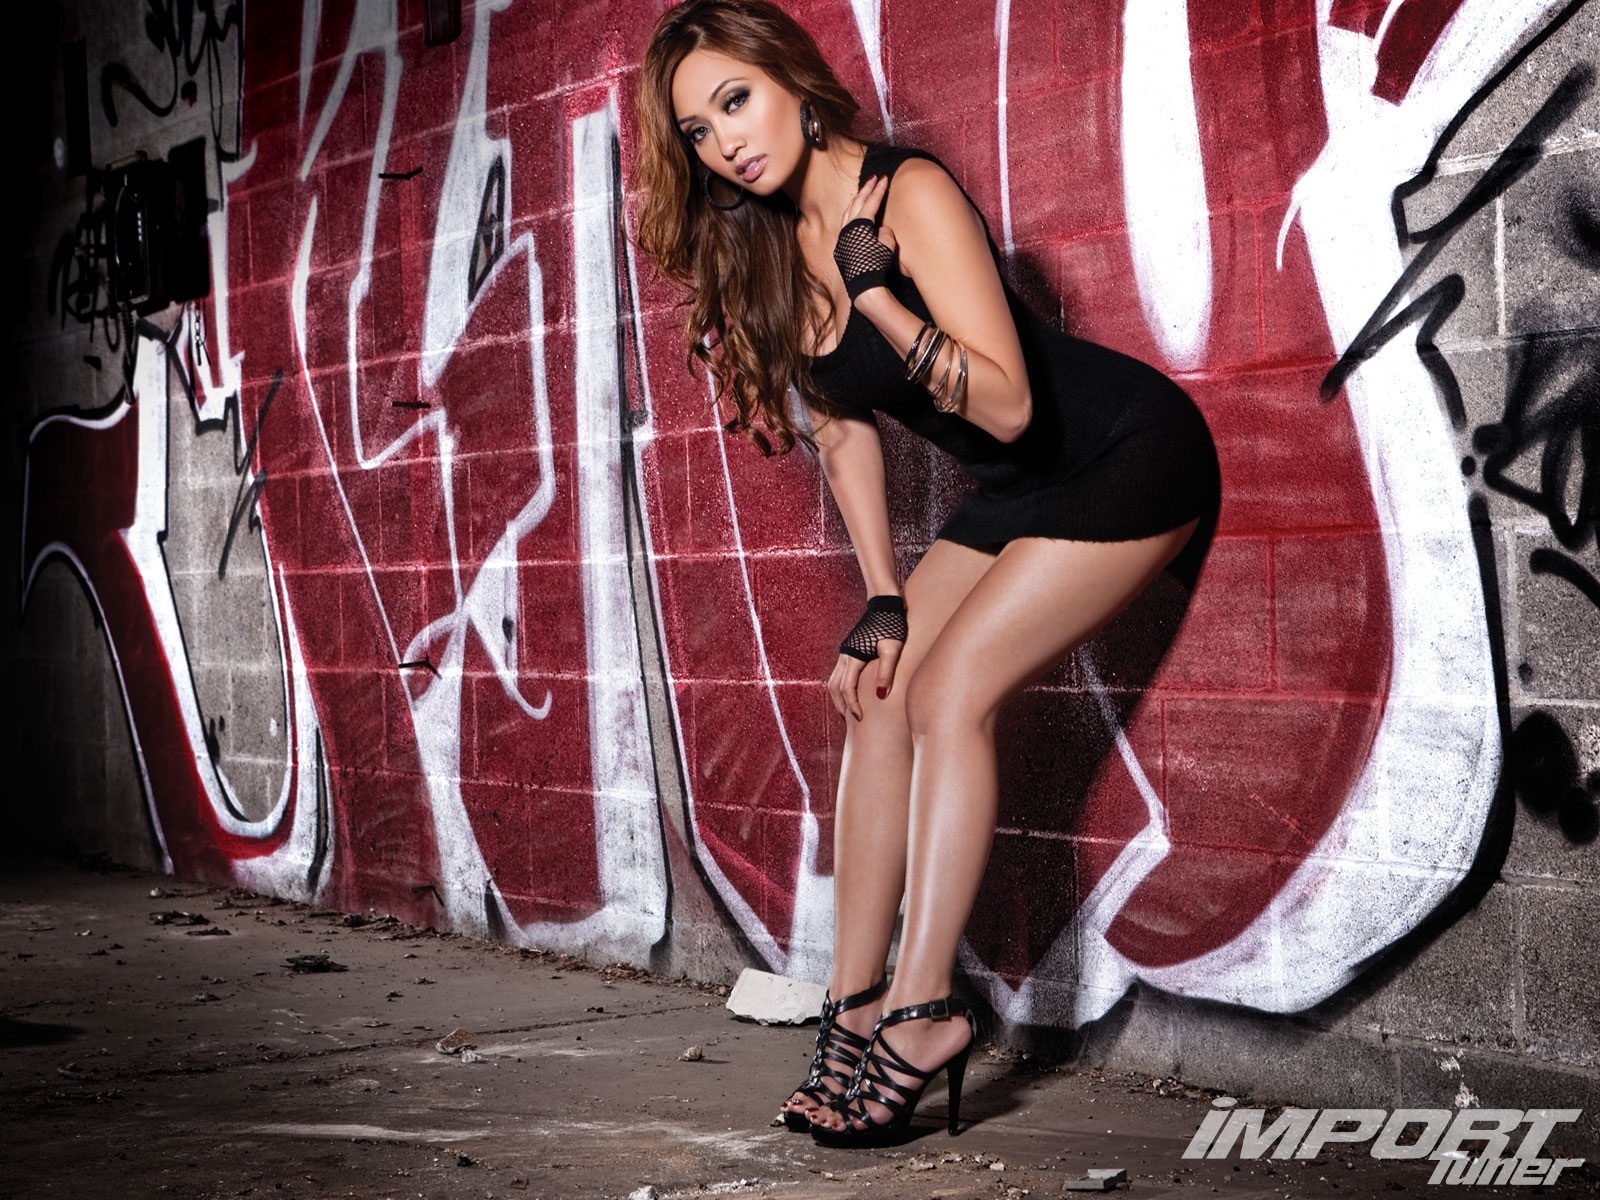 Jennifer Lee Model Import Tuner Magazine